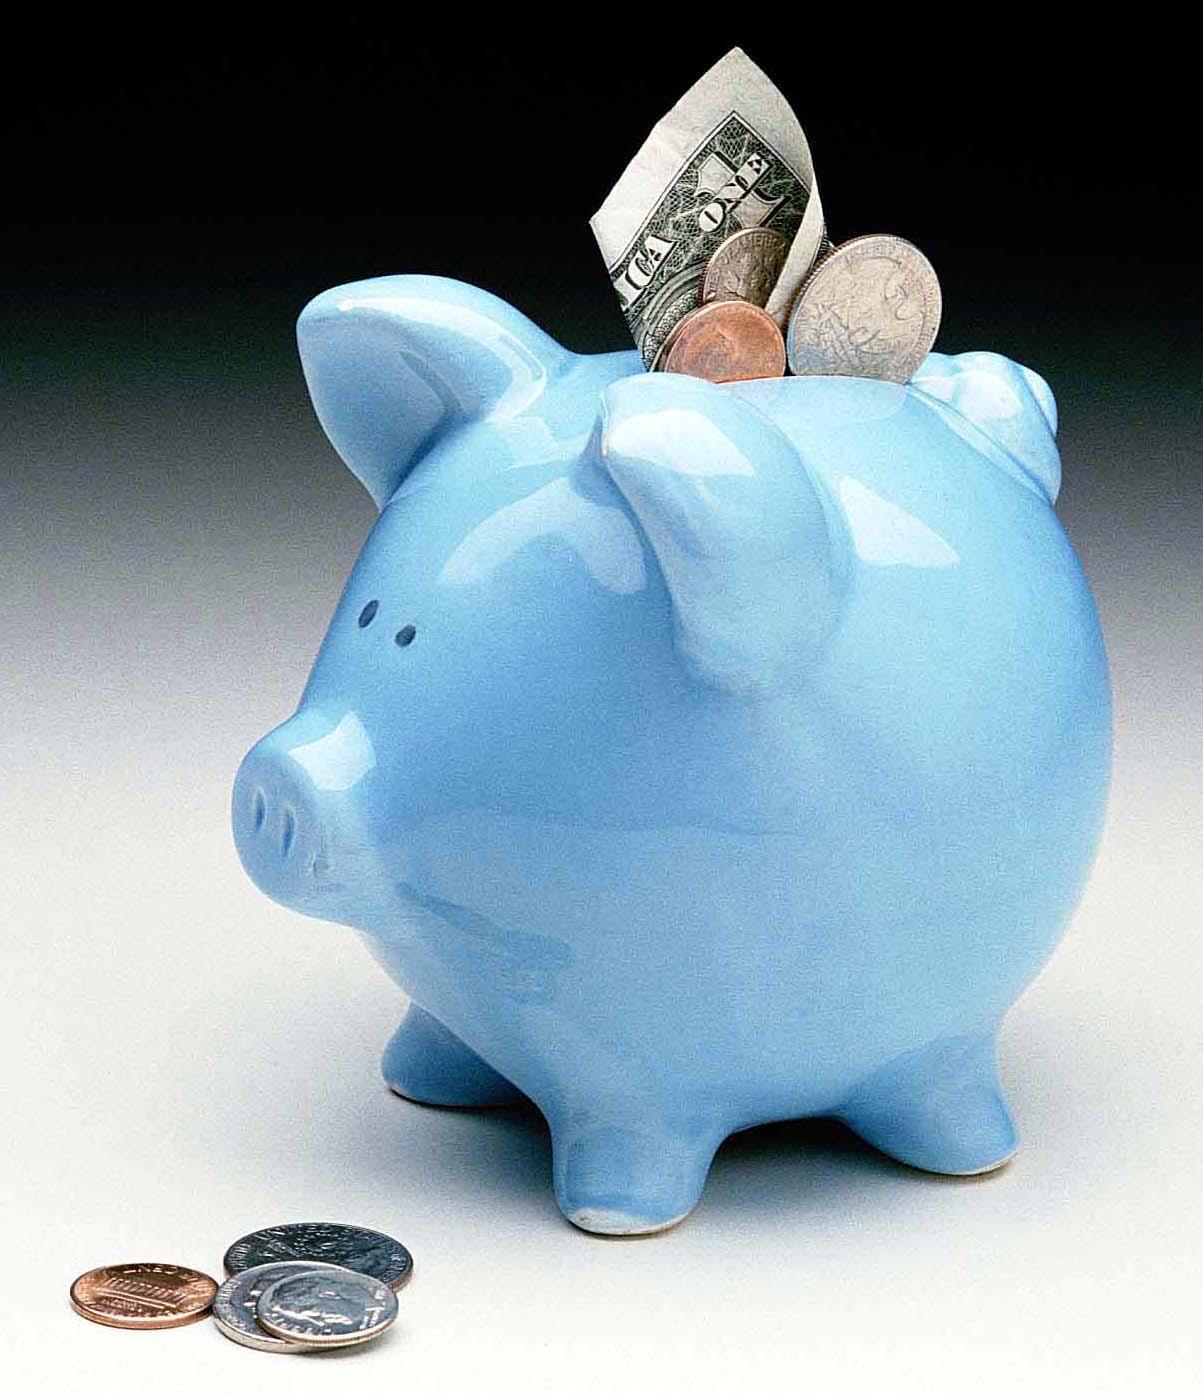 Easy Savings: 4 Ways To Help You Save Money